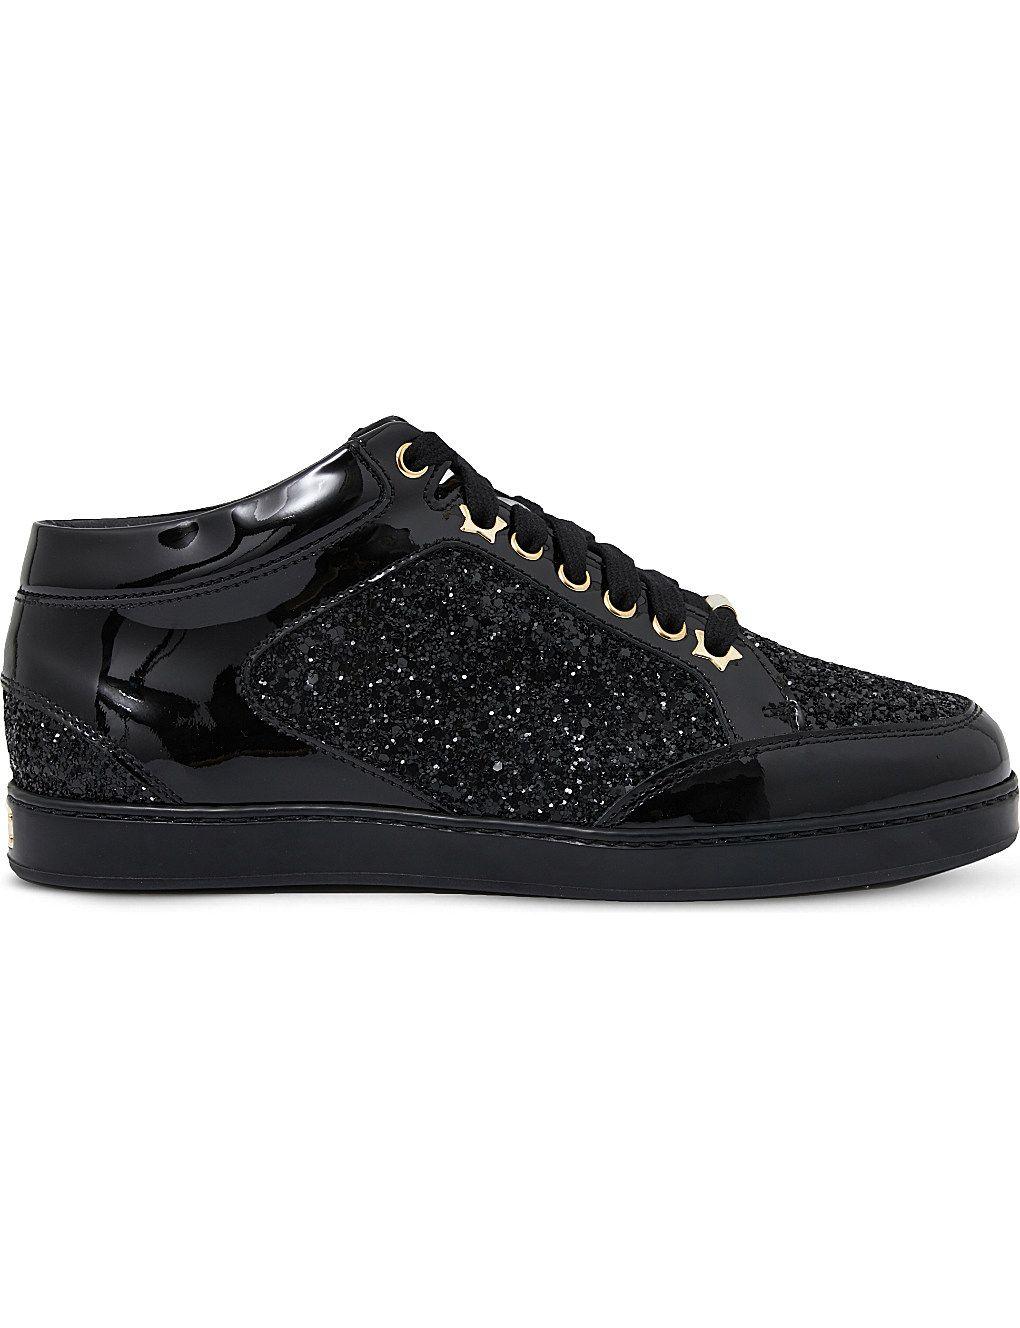 Boot shoes women, Glitter sneakers